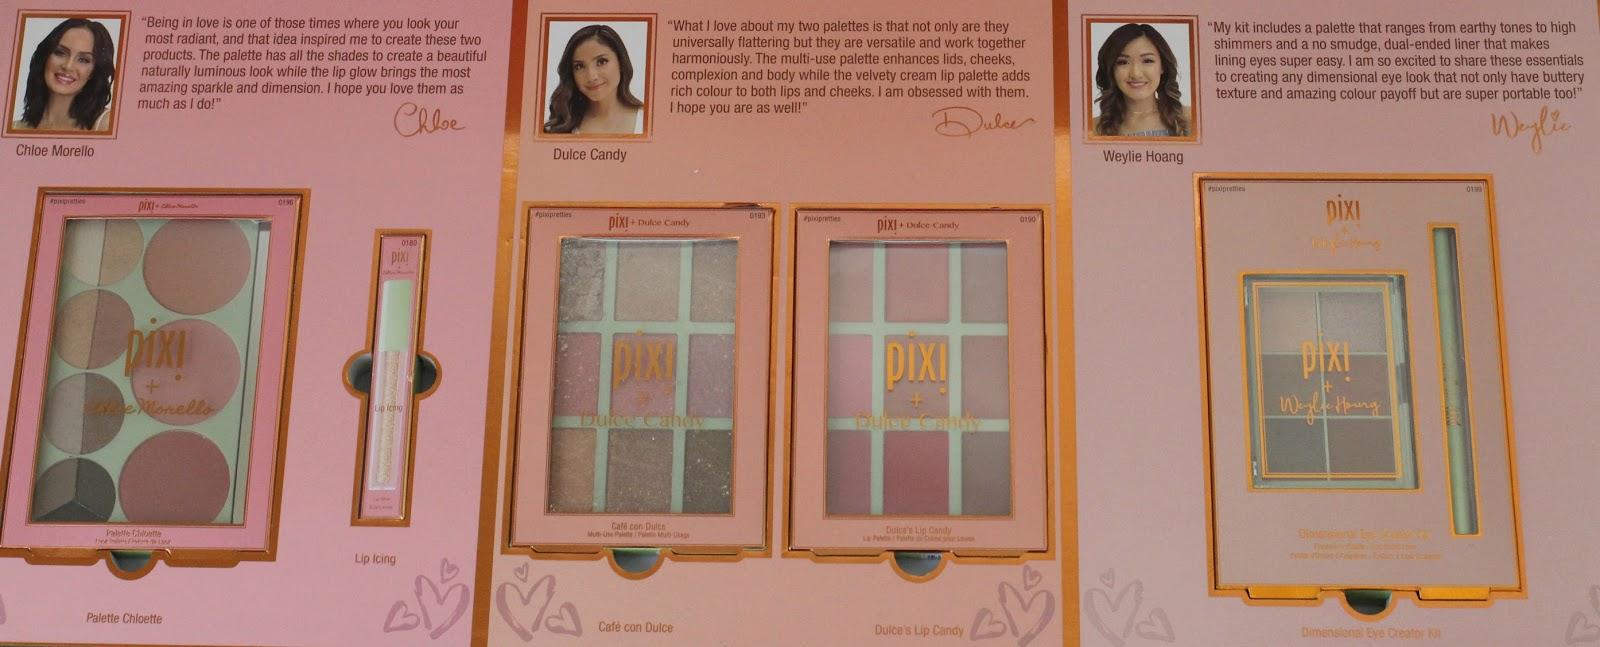 Pixi Beauty 2018 Pixi Pretties Collection: Chloe Morello, Dulce